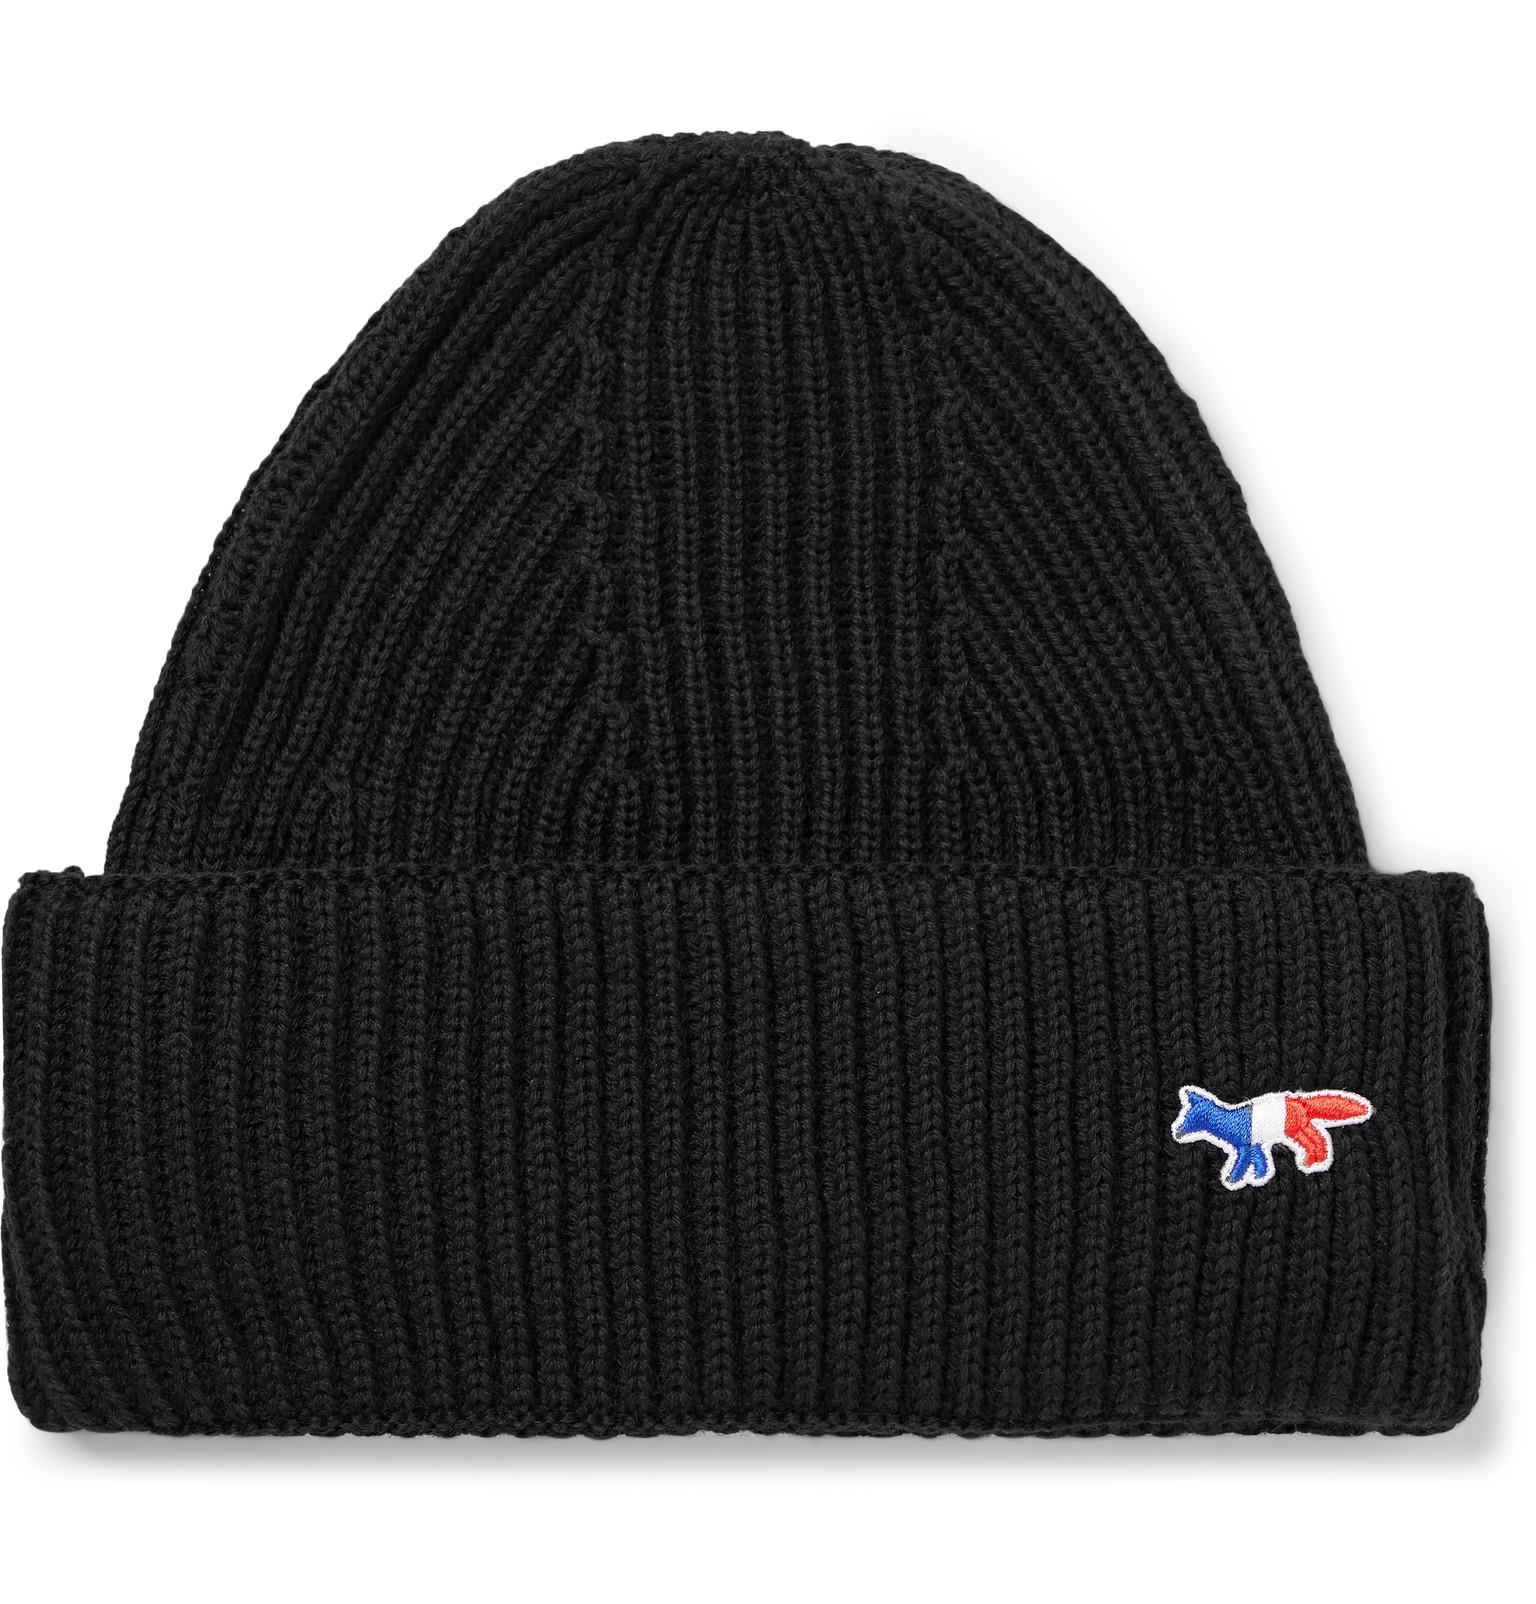 c7fa028b0d1 Maison Kitsuné Logo-appliquéd Ribbed Wool Beanie in Black for Men ...